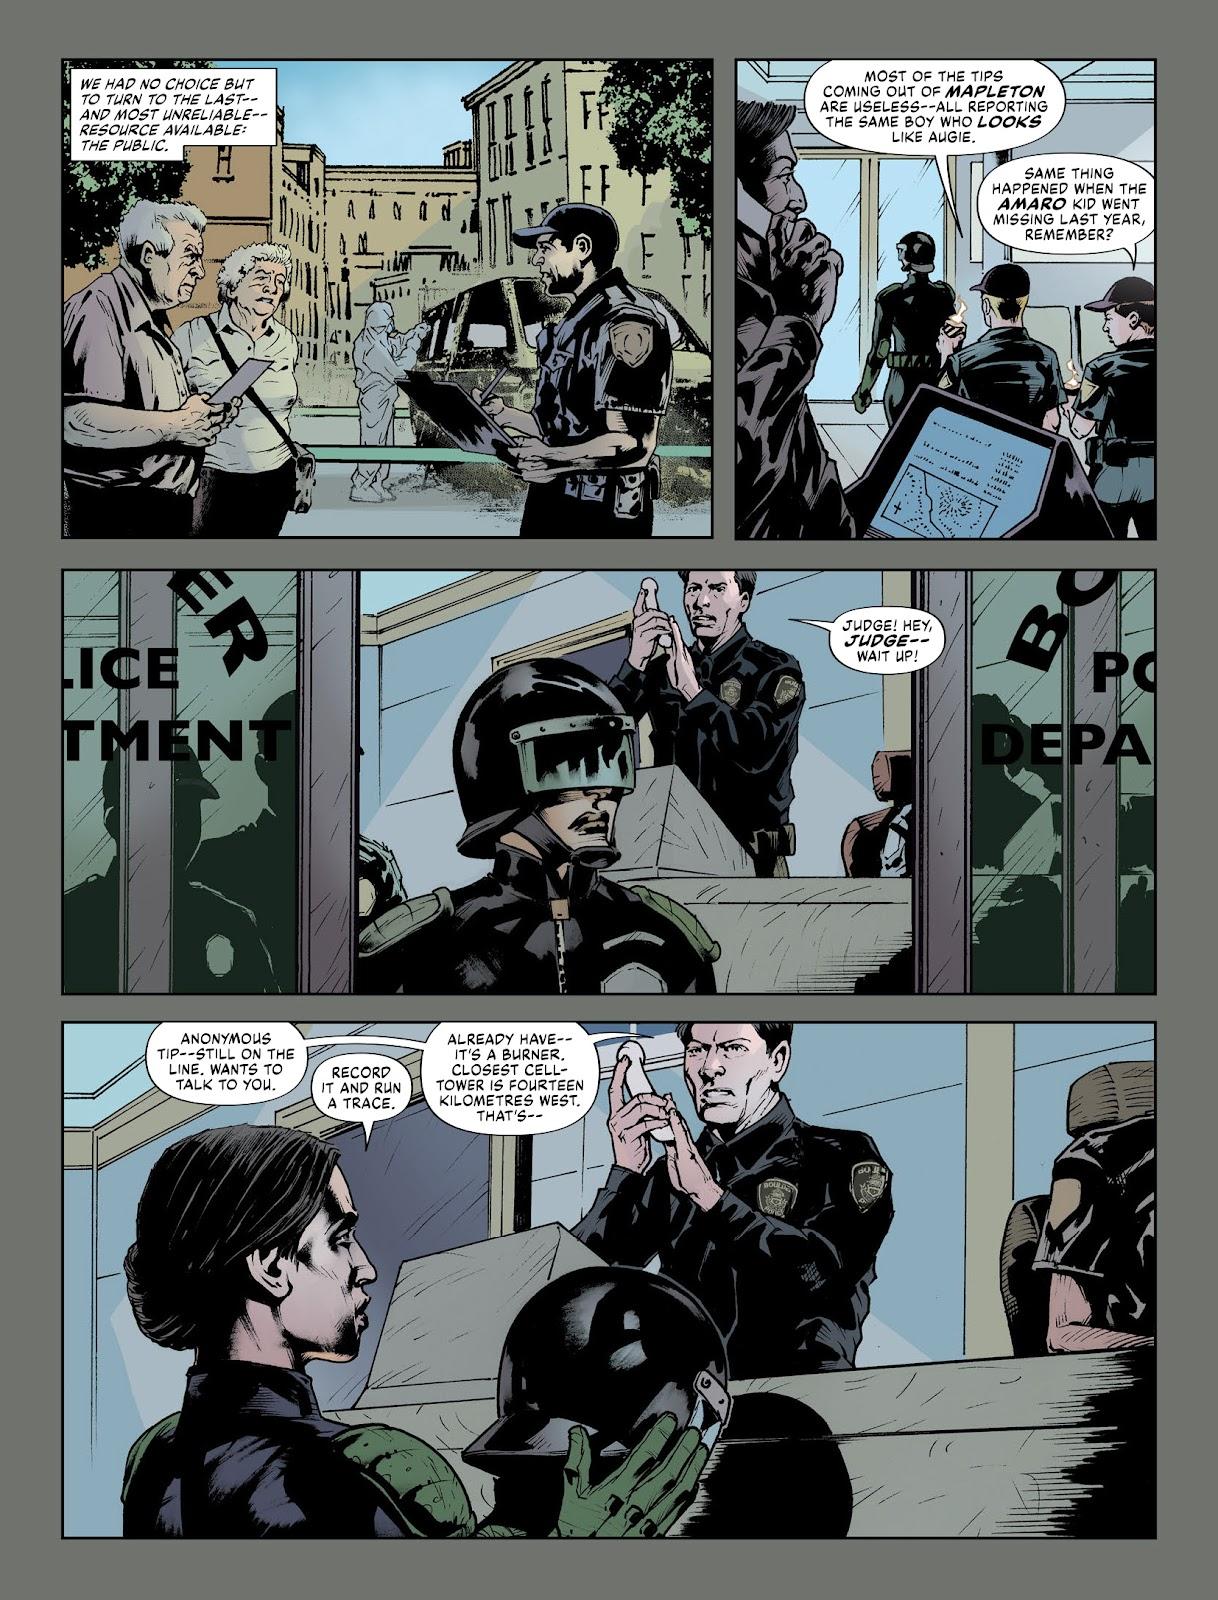 Judge Dredd Megazine (Vol. 5) issue 427 - Page 33